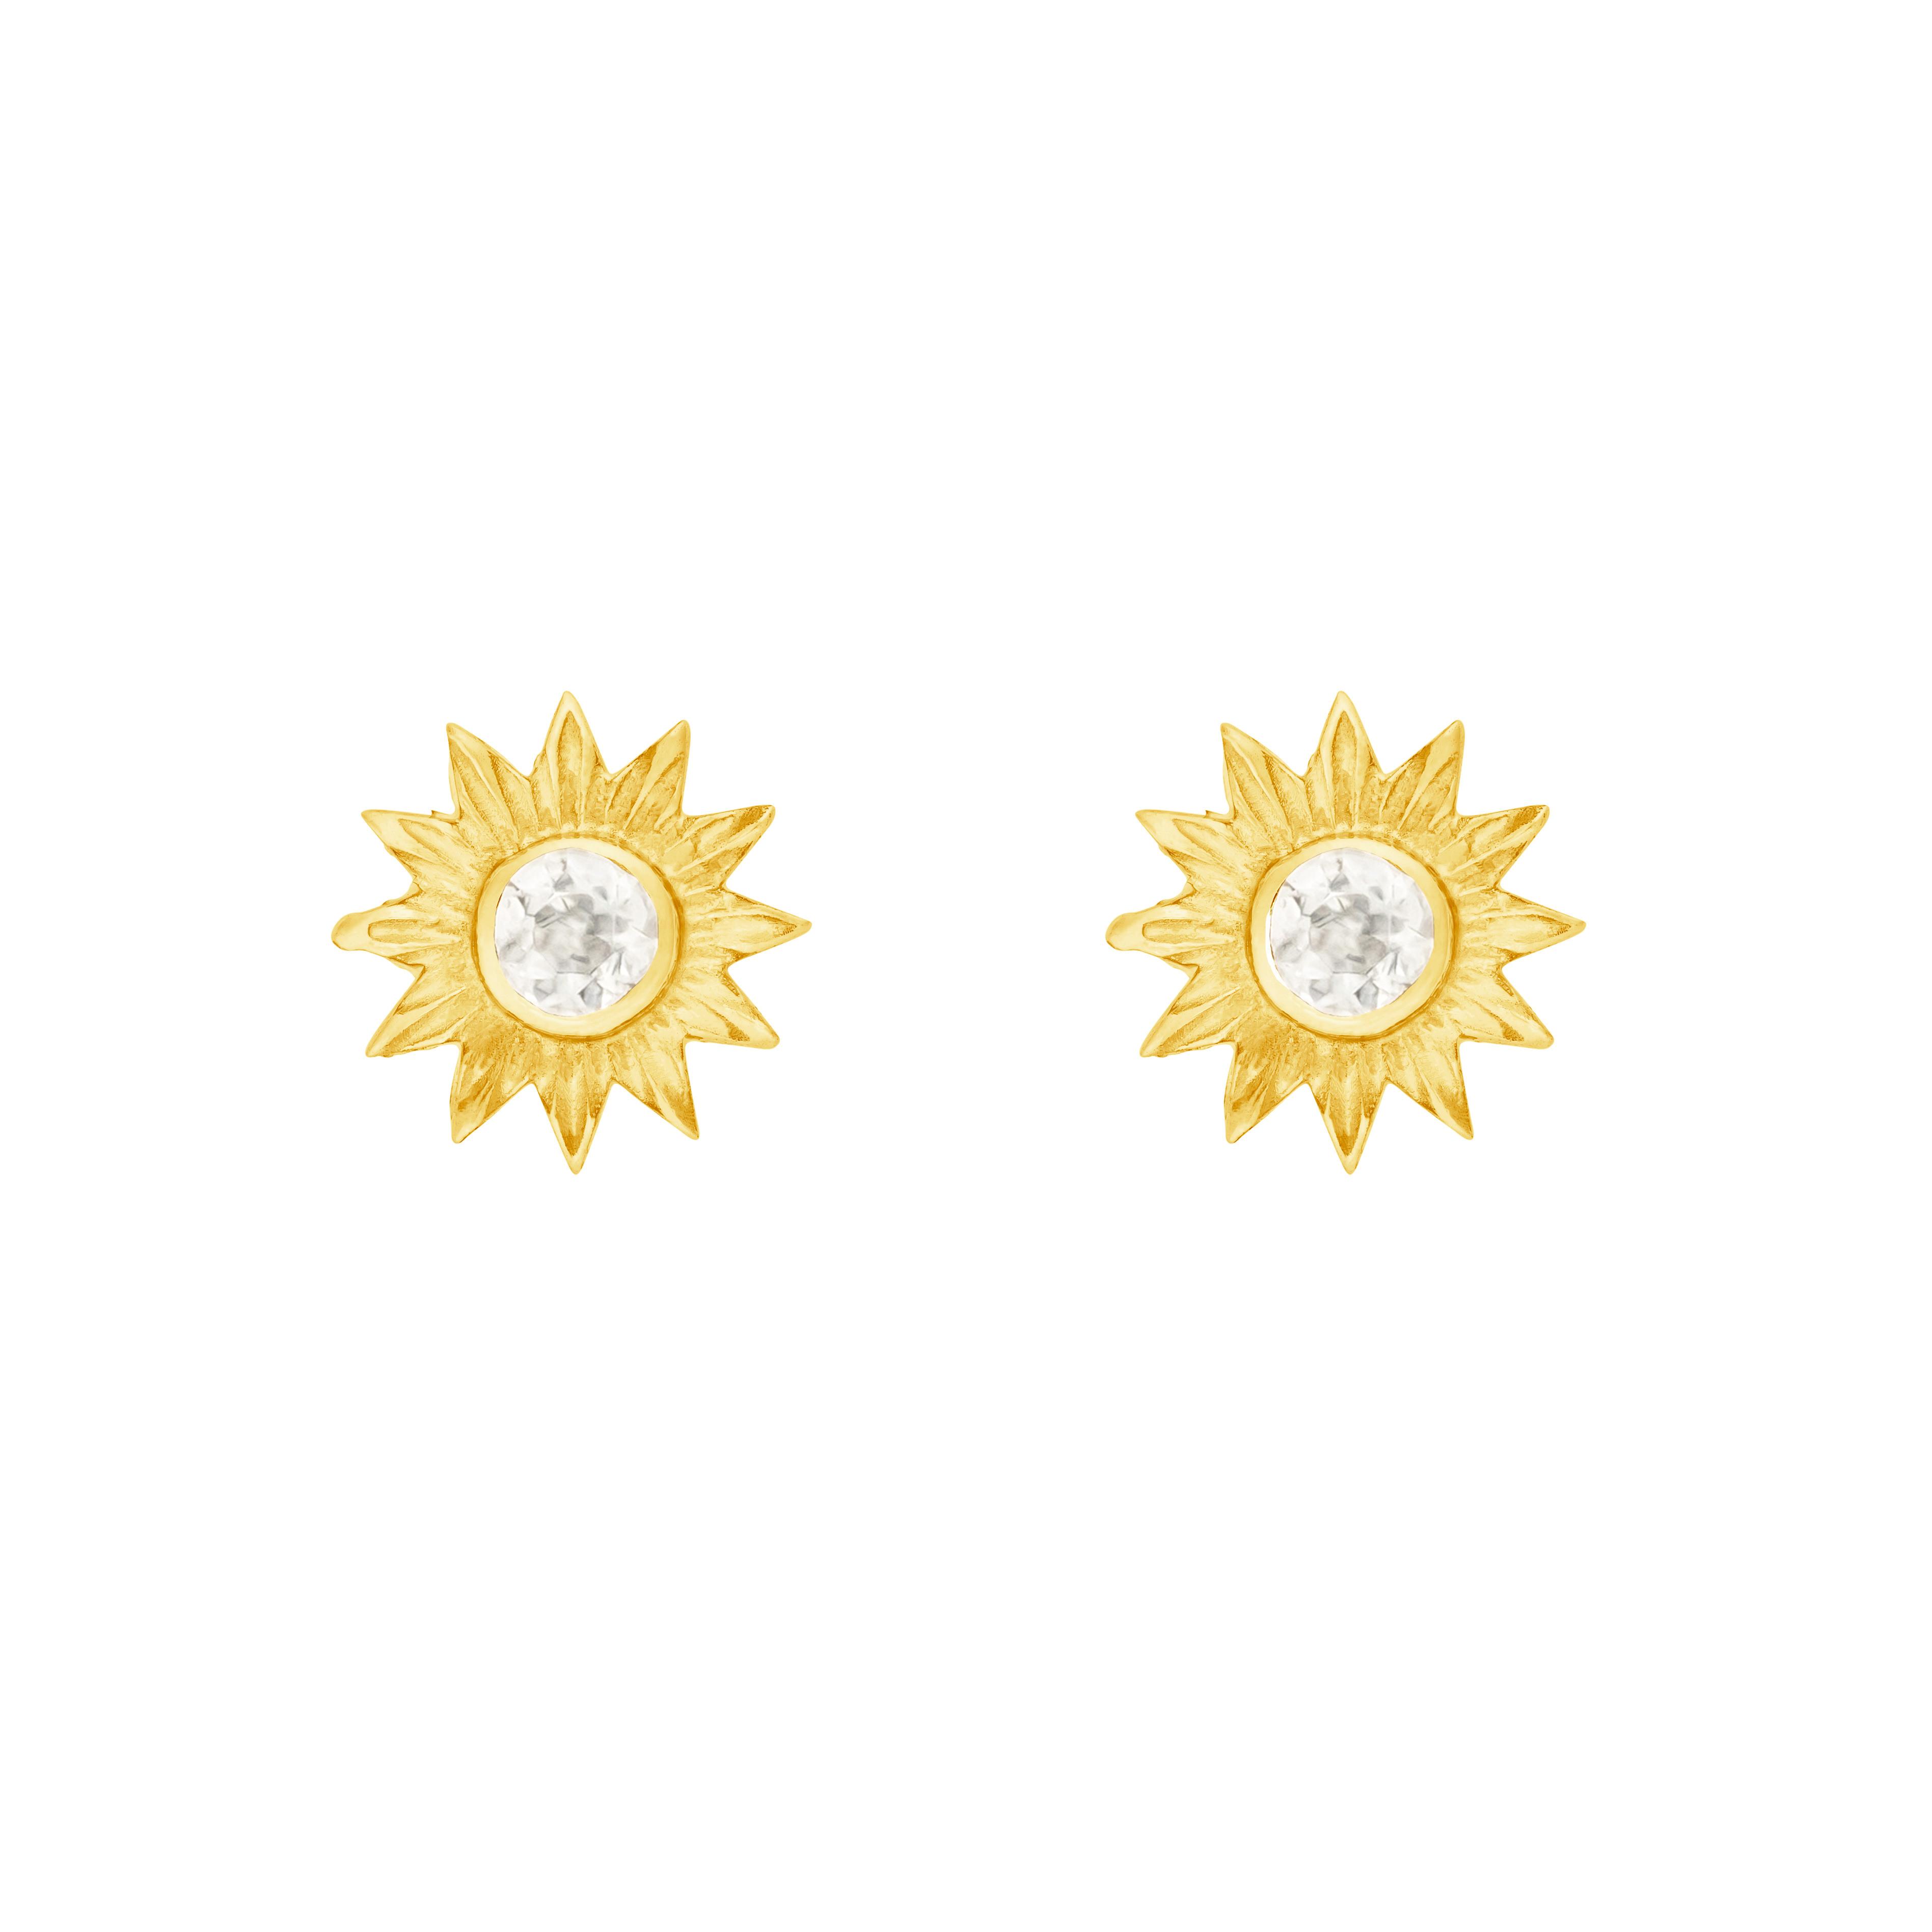 Categories: Fashion, Inspiration-Zoe & Morgan Wheels of Light